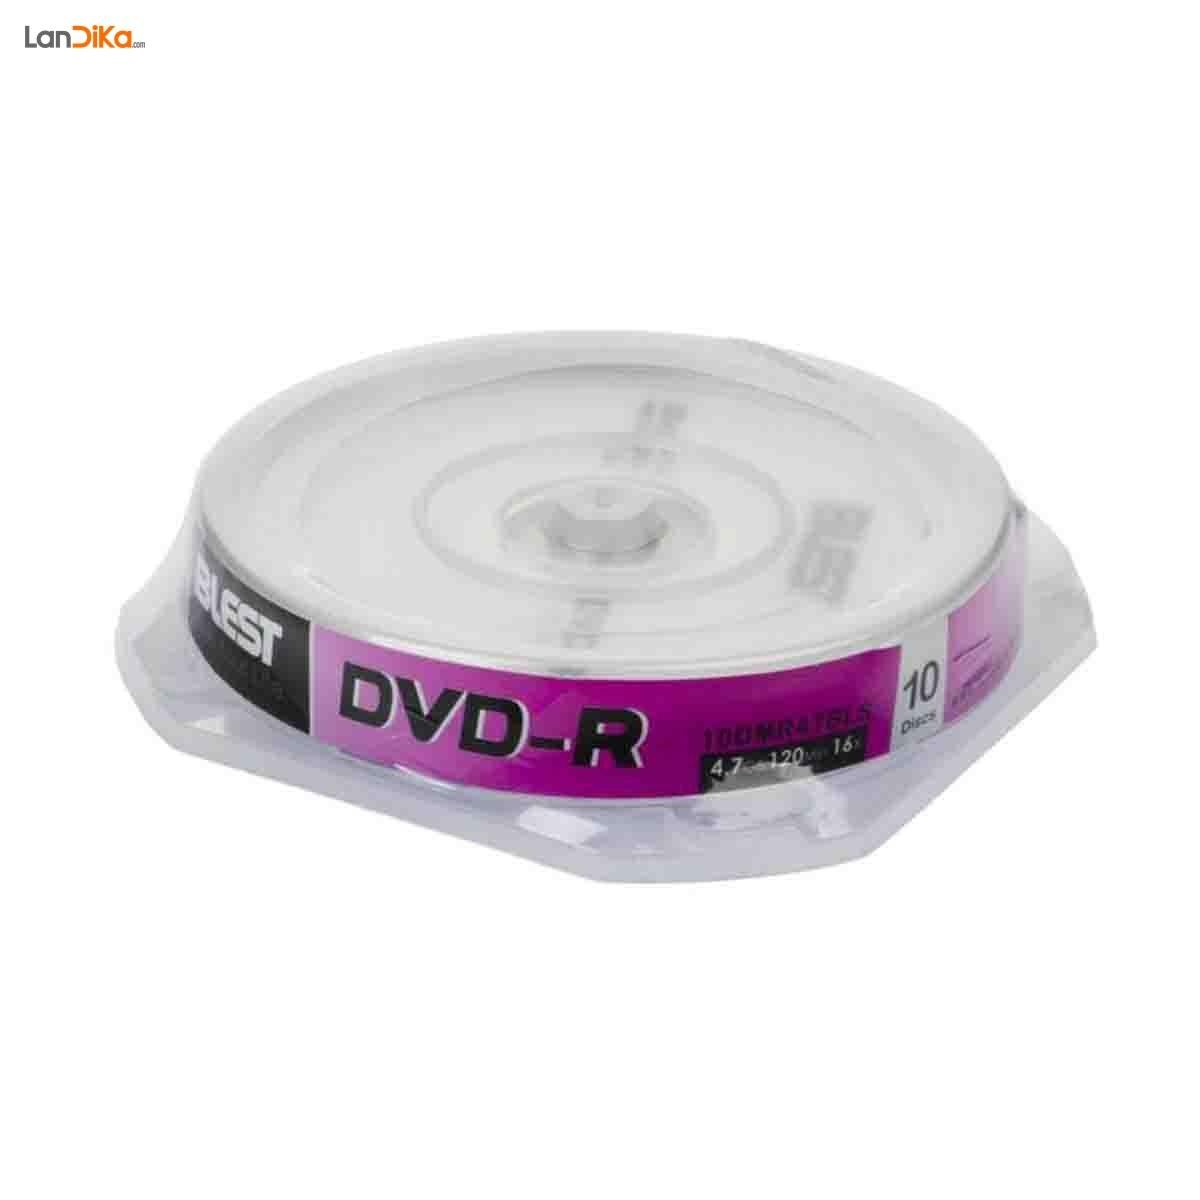 دی وی دی خام بلست مدل DVD-R بسته 10 عددی | Blest DVD-R - Pack of 10